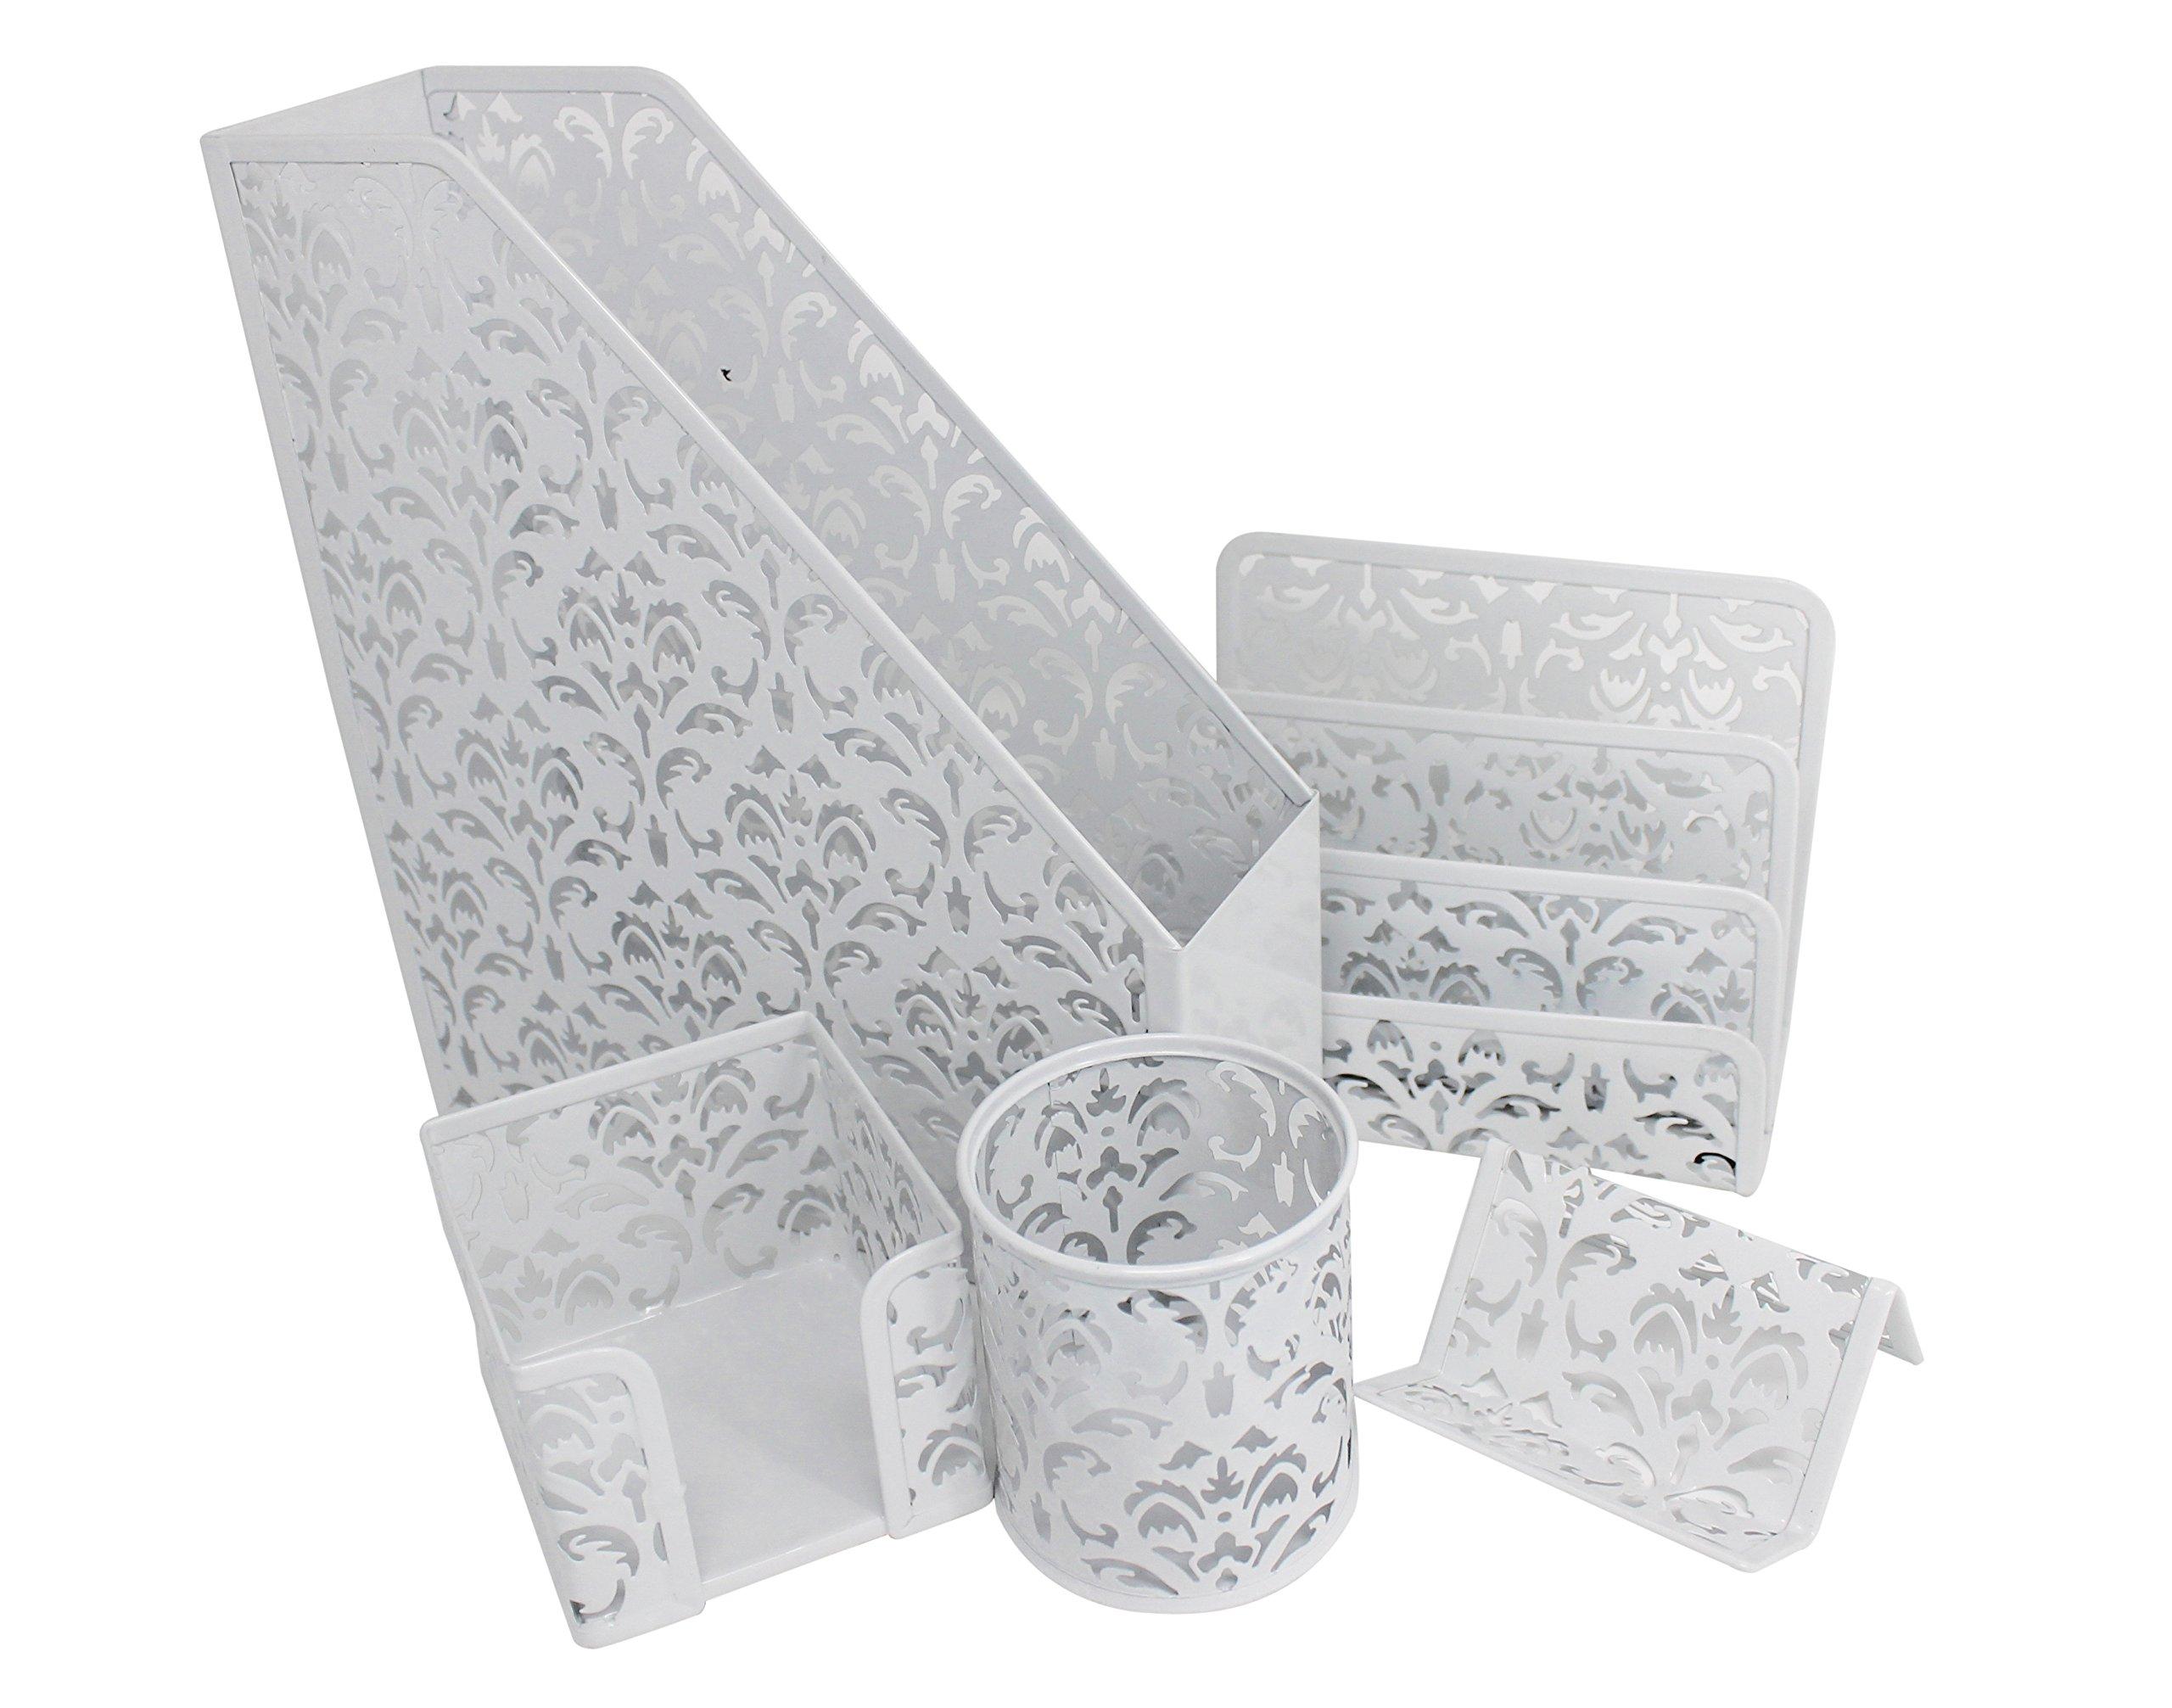 Desktop Organizer Set - 5pcs Office Supplies | Metal Mesh File, Pen, and Business Card Holder, Letter Sorter, Sticky Note Memo Pad Desk Accessories | Hollow Flower Pattern - White